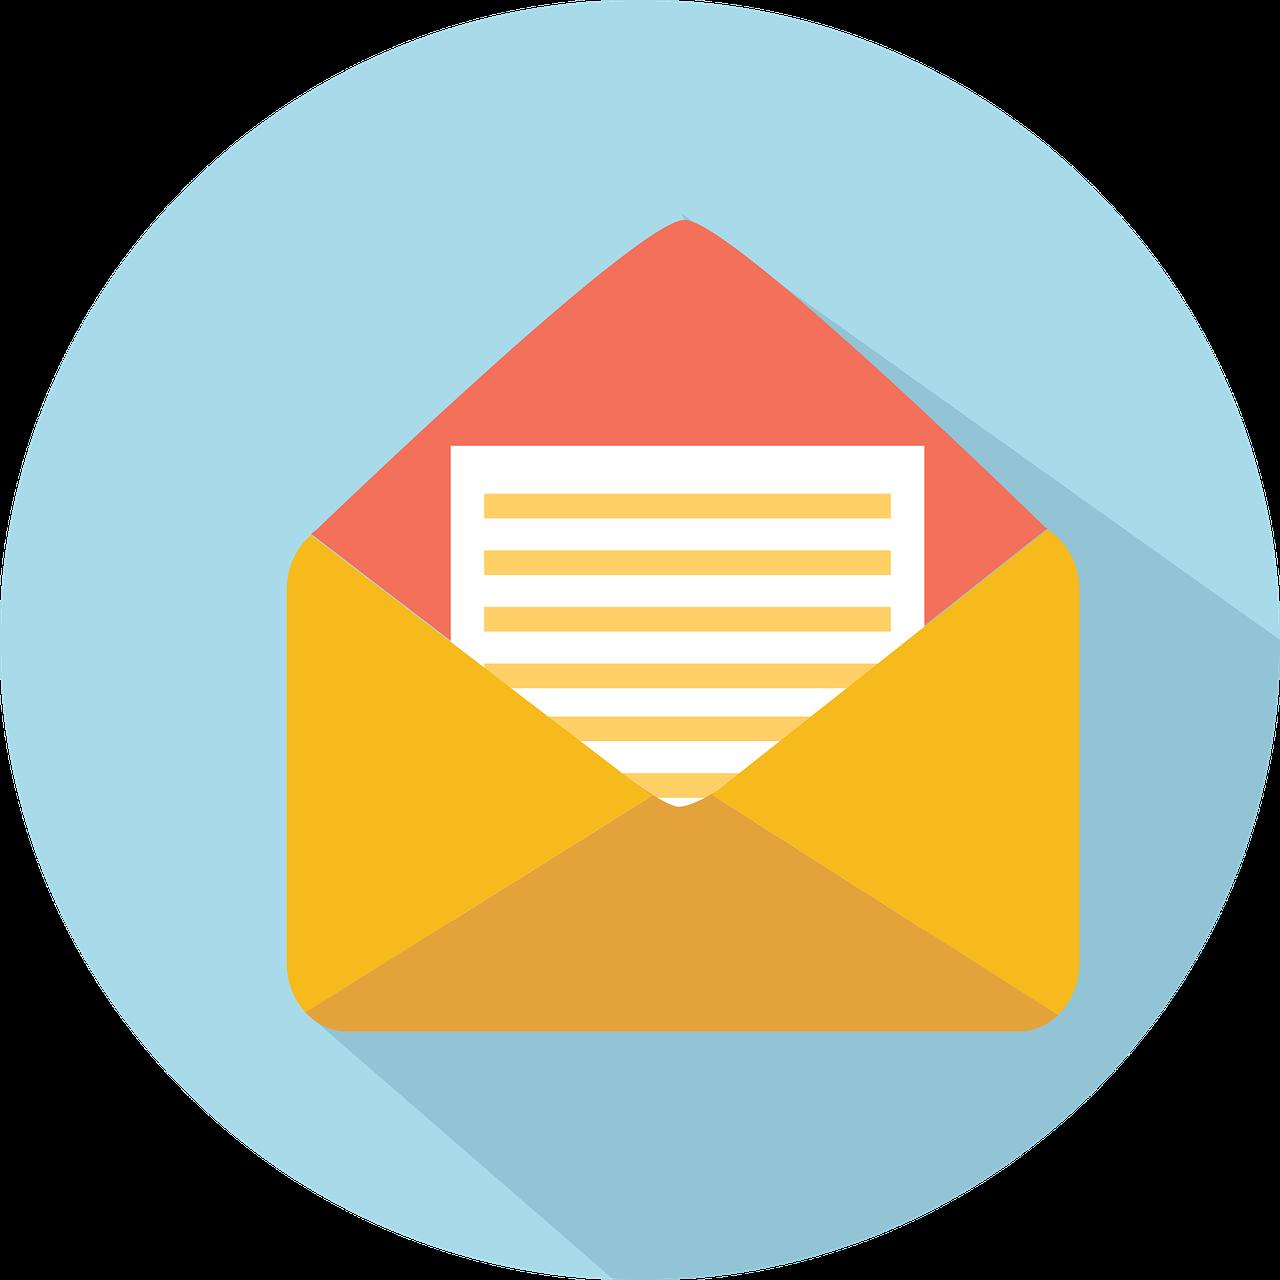 envelope, email, open envelope